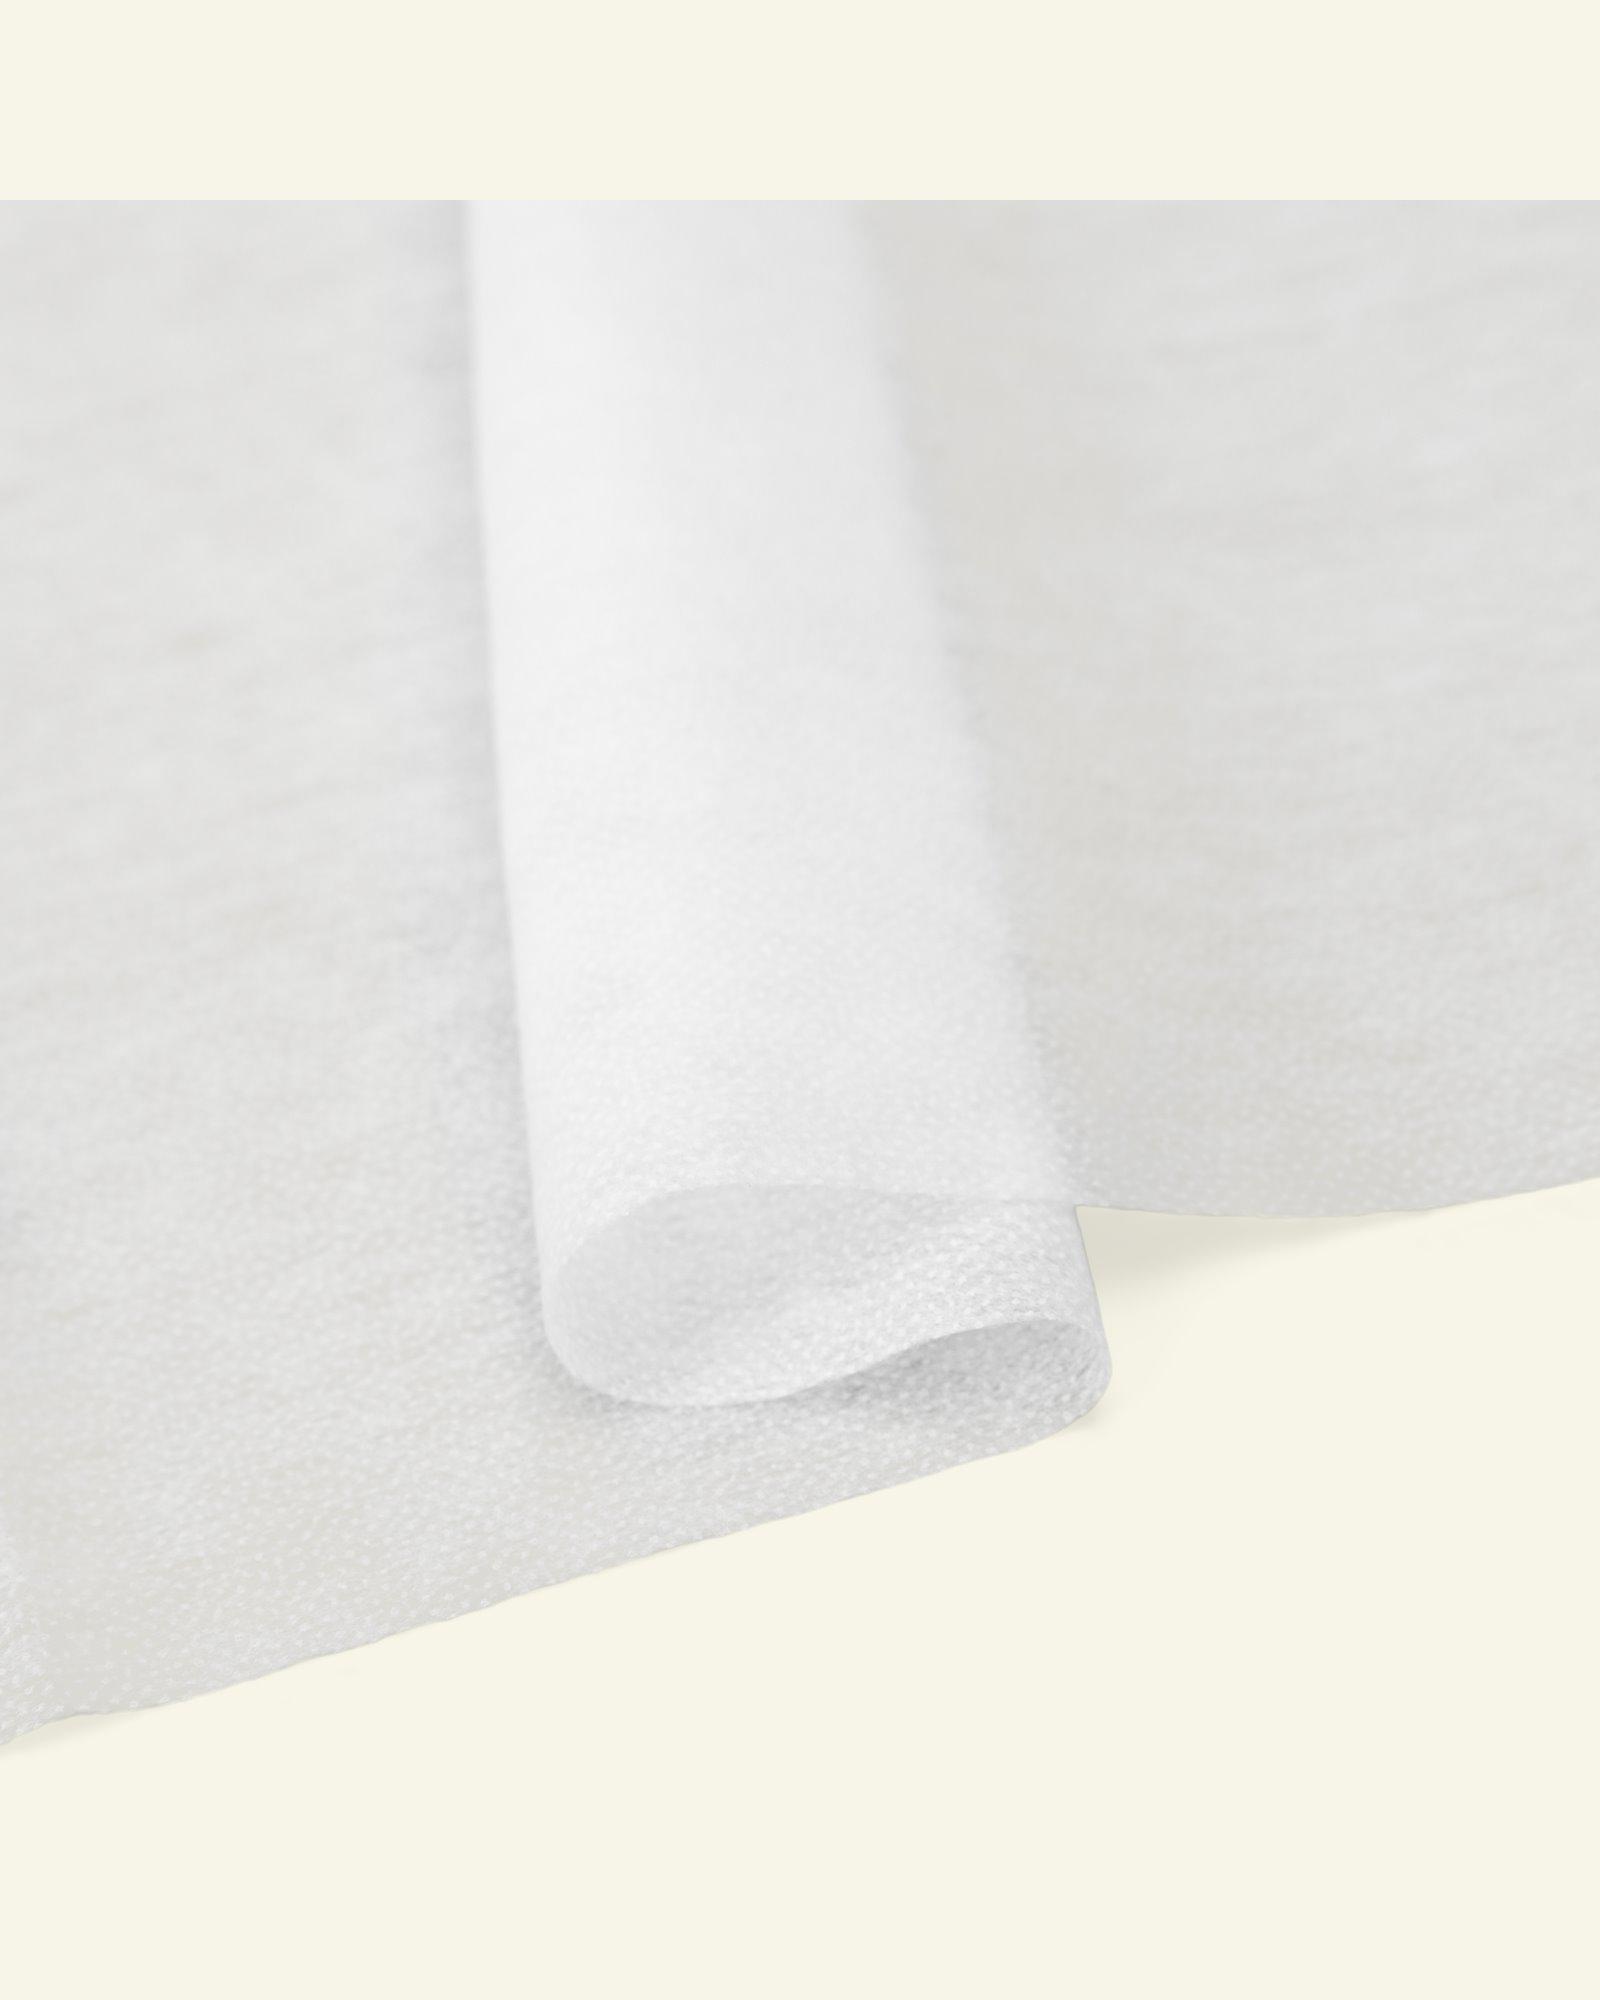 Stretch knitted interlining white w/glue